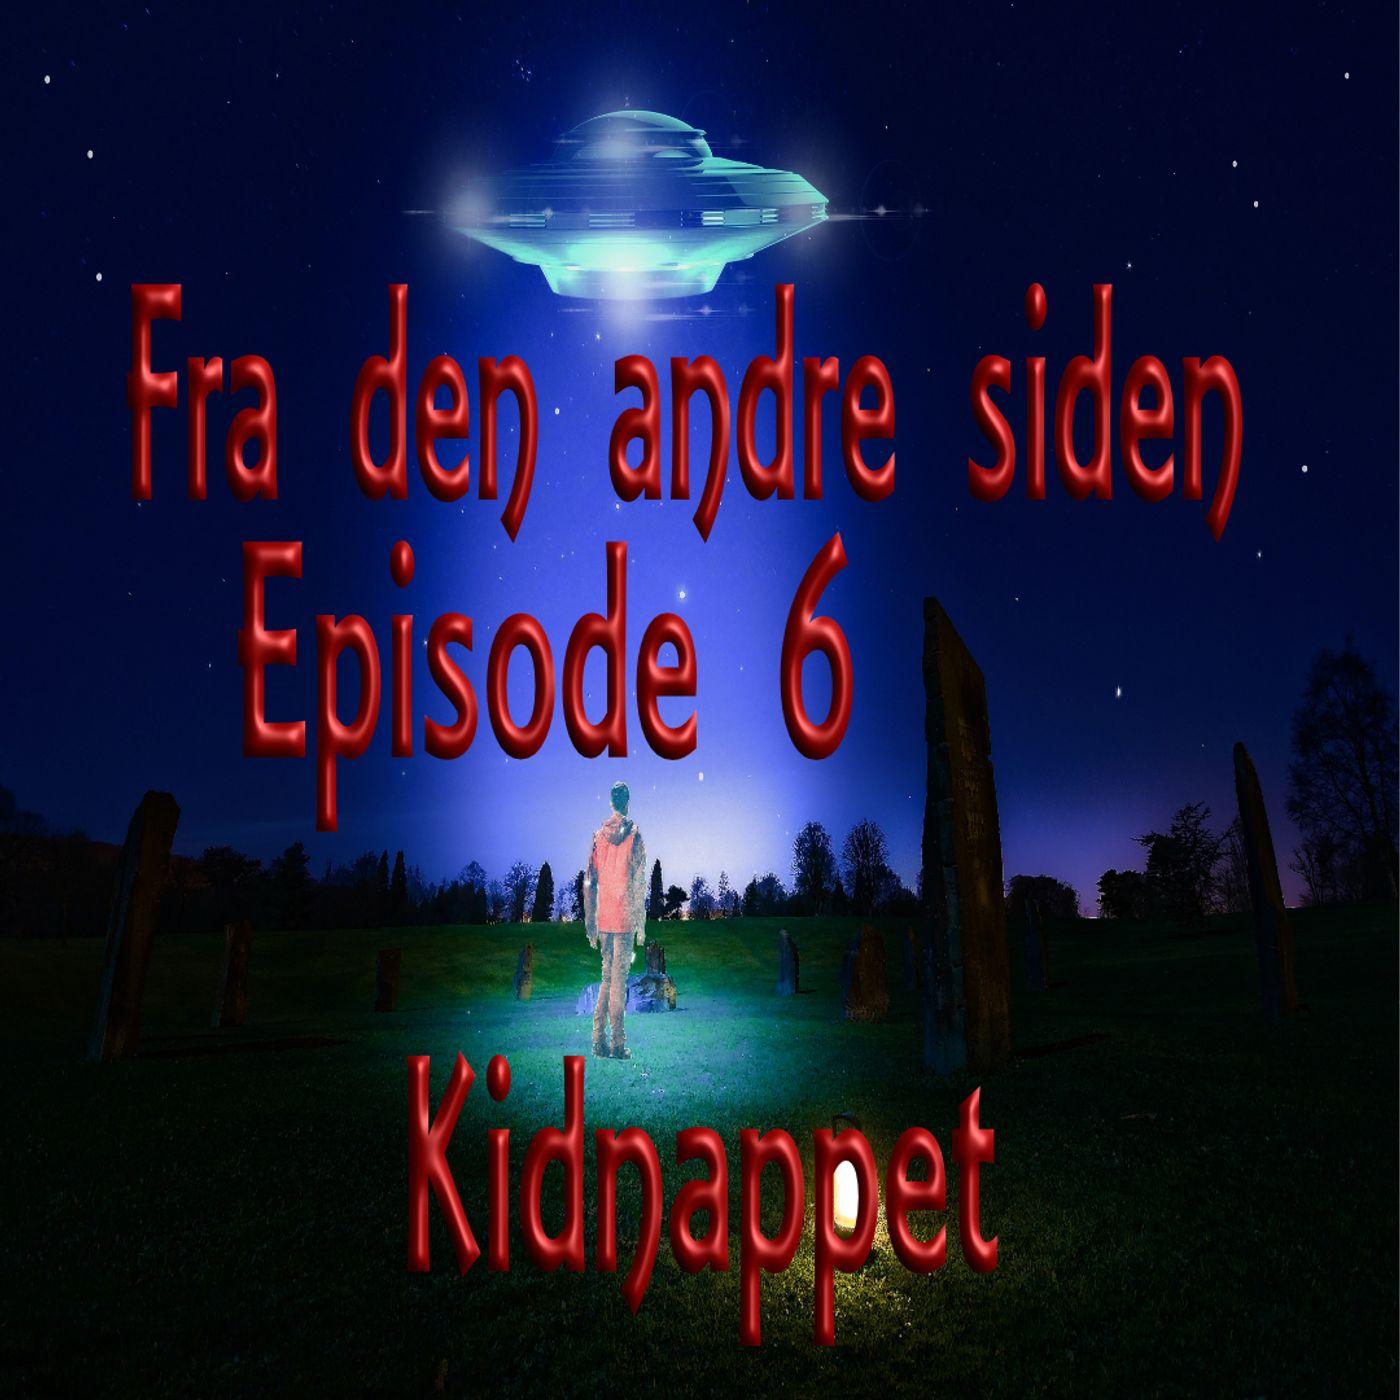 Fra den andre siden episode 6. Kidnappet.